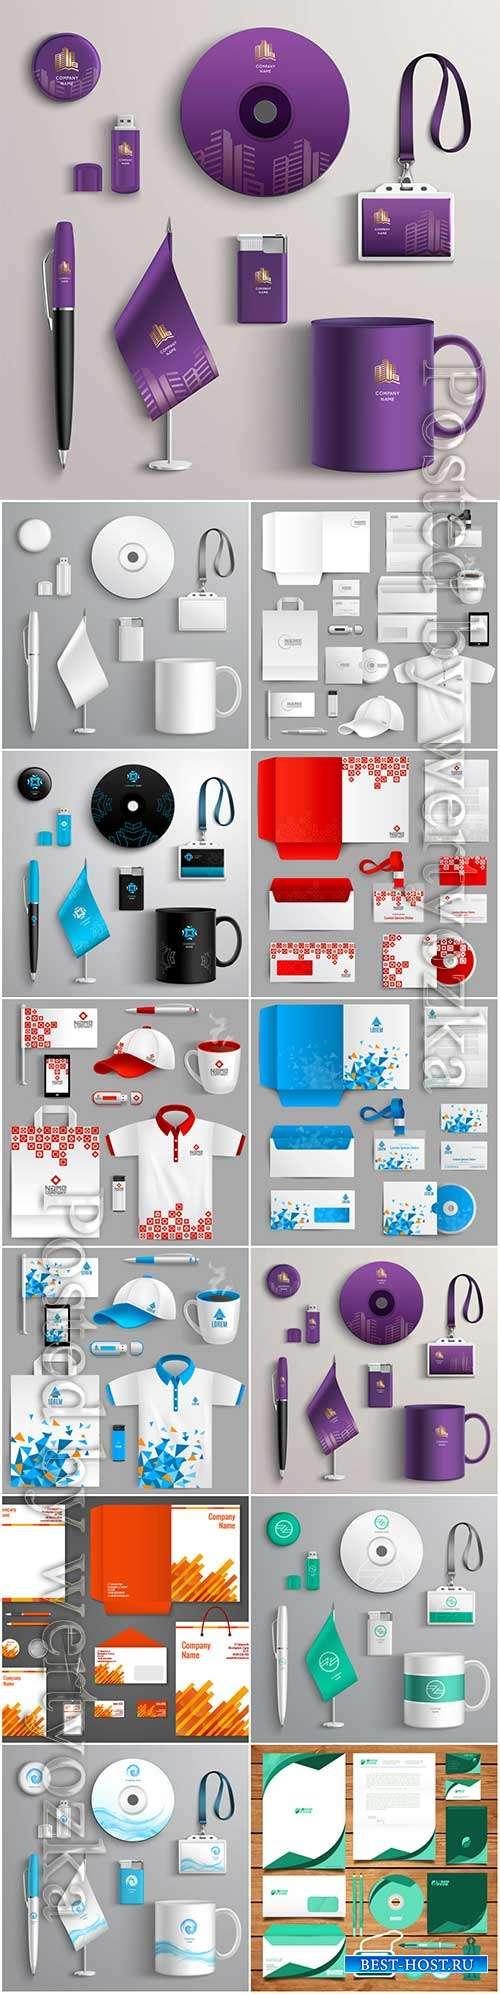 Corporate identity vector design